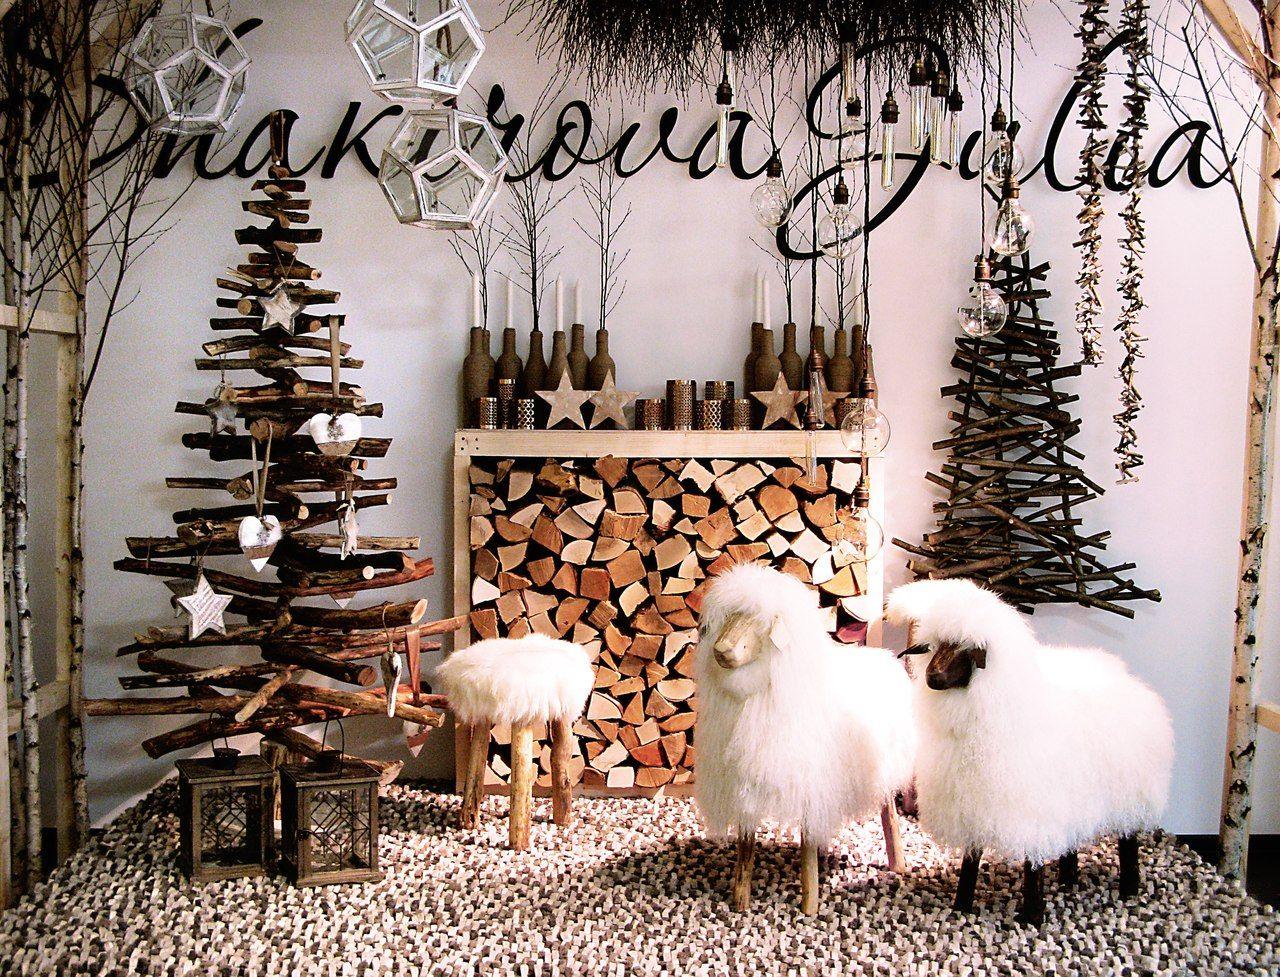 овечки, ёлочки из коряг, табуреточки для Юли Шакировой